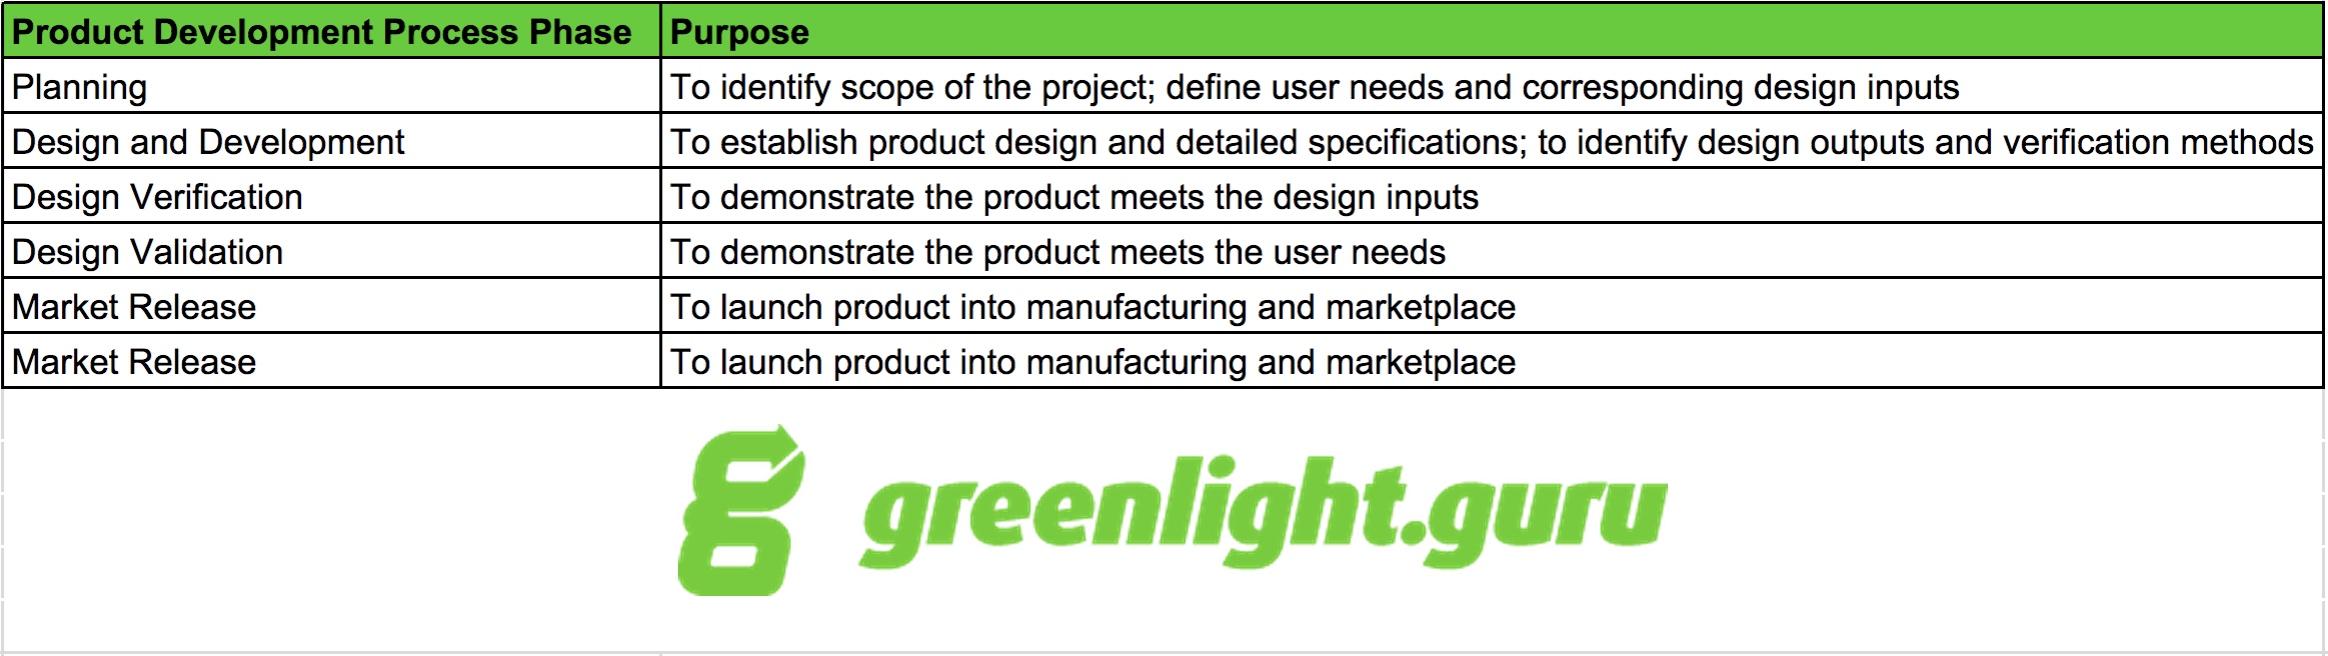 medical device product development process - greenlight.guru